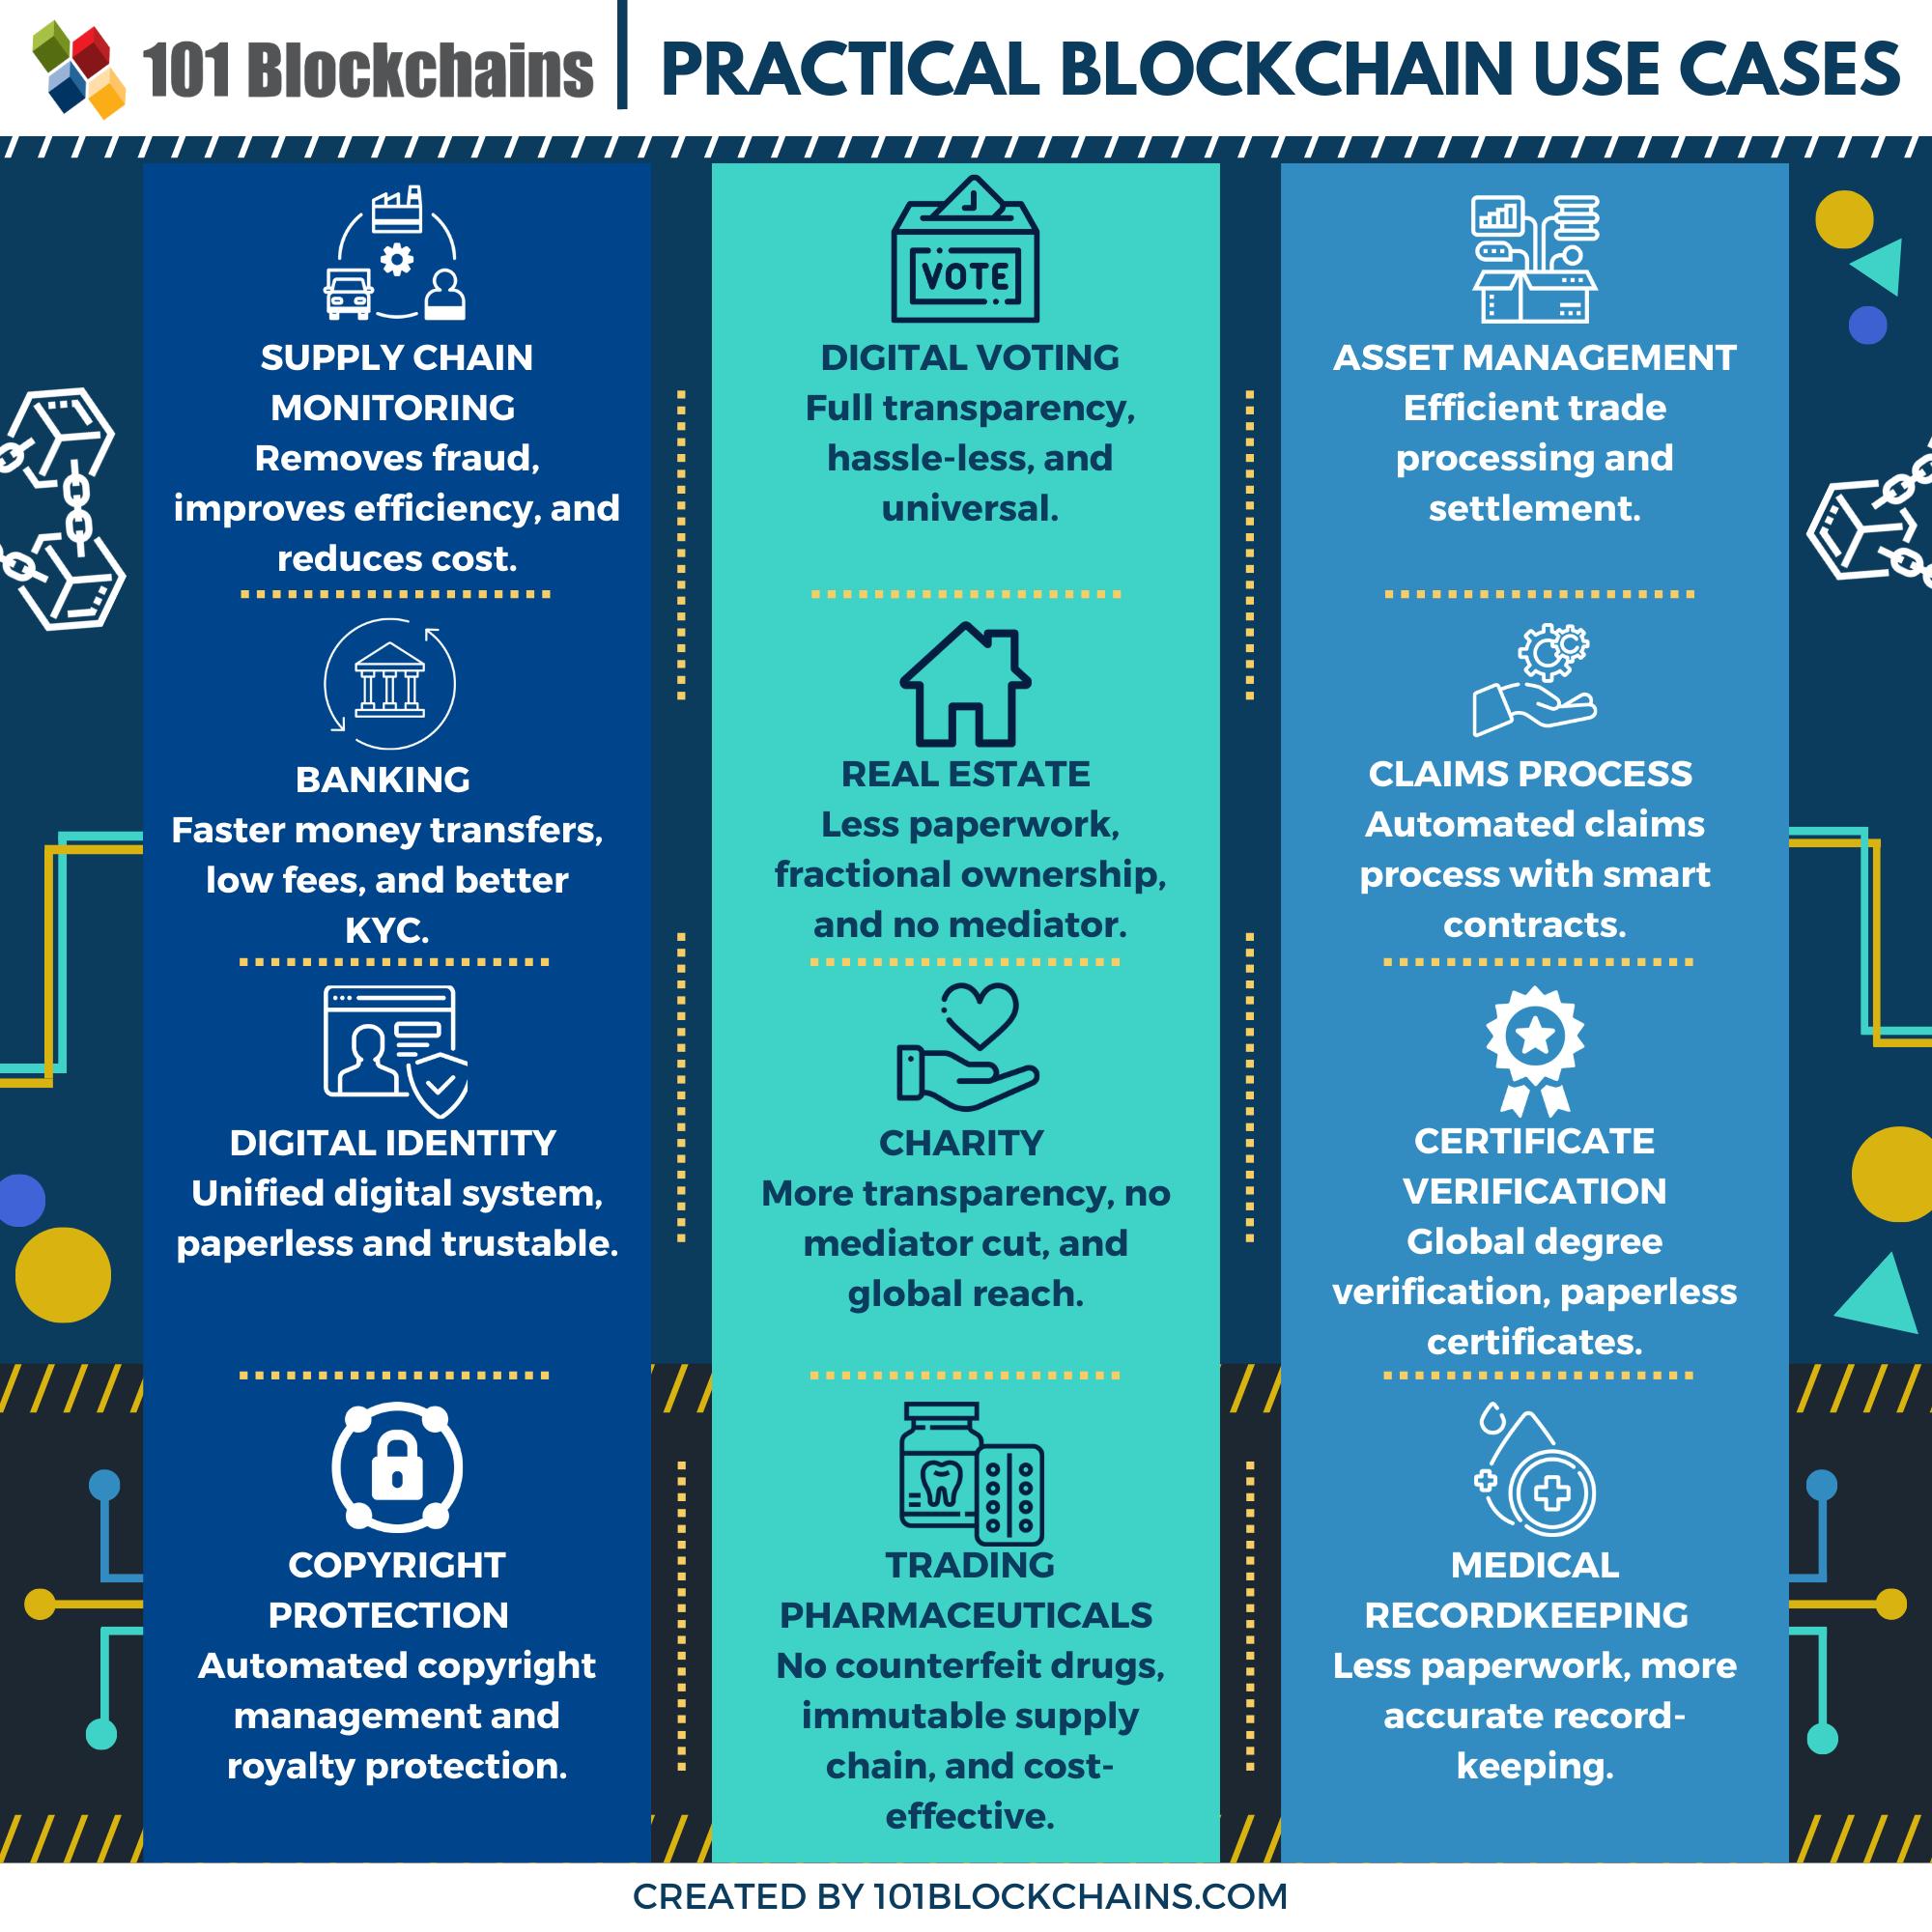 12 Practical Blockchain Use Cases For 2020 101blockchains Via Mikequindazzi Ai Smartcontracts Fintech Payments Iot Blockchain Fintech Use Case